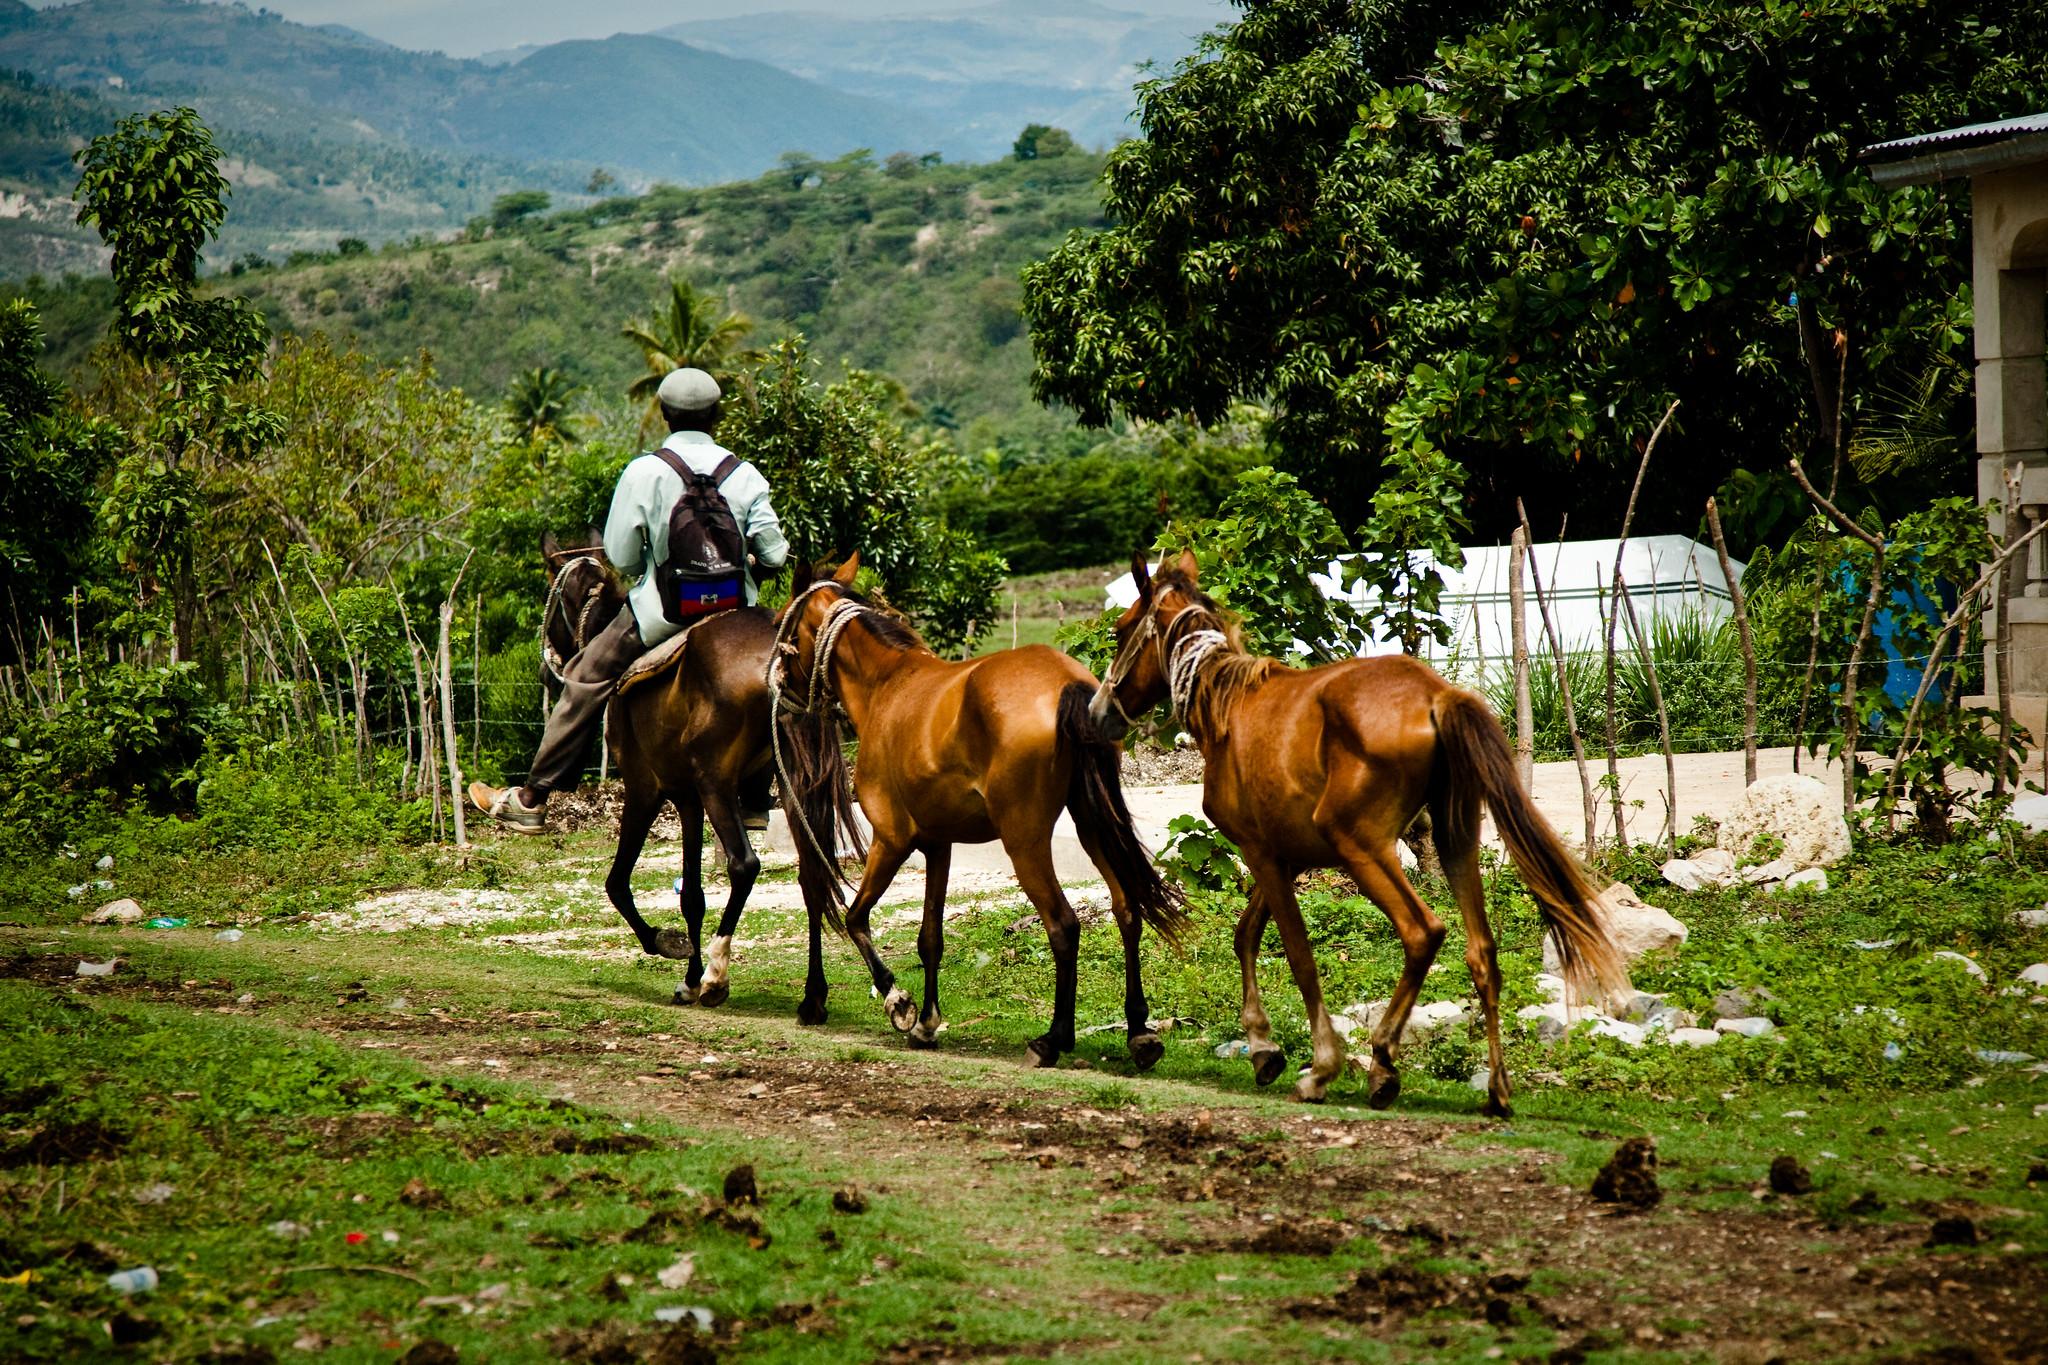 Man leading horses